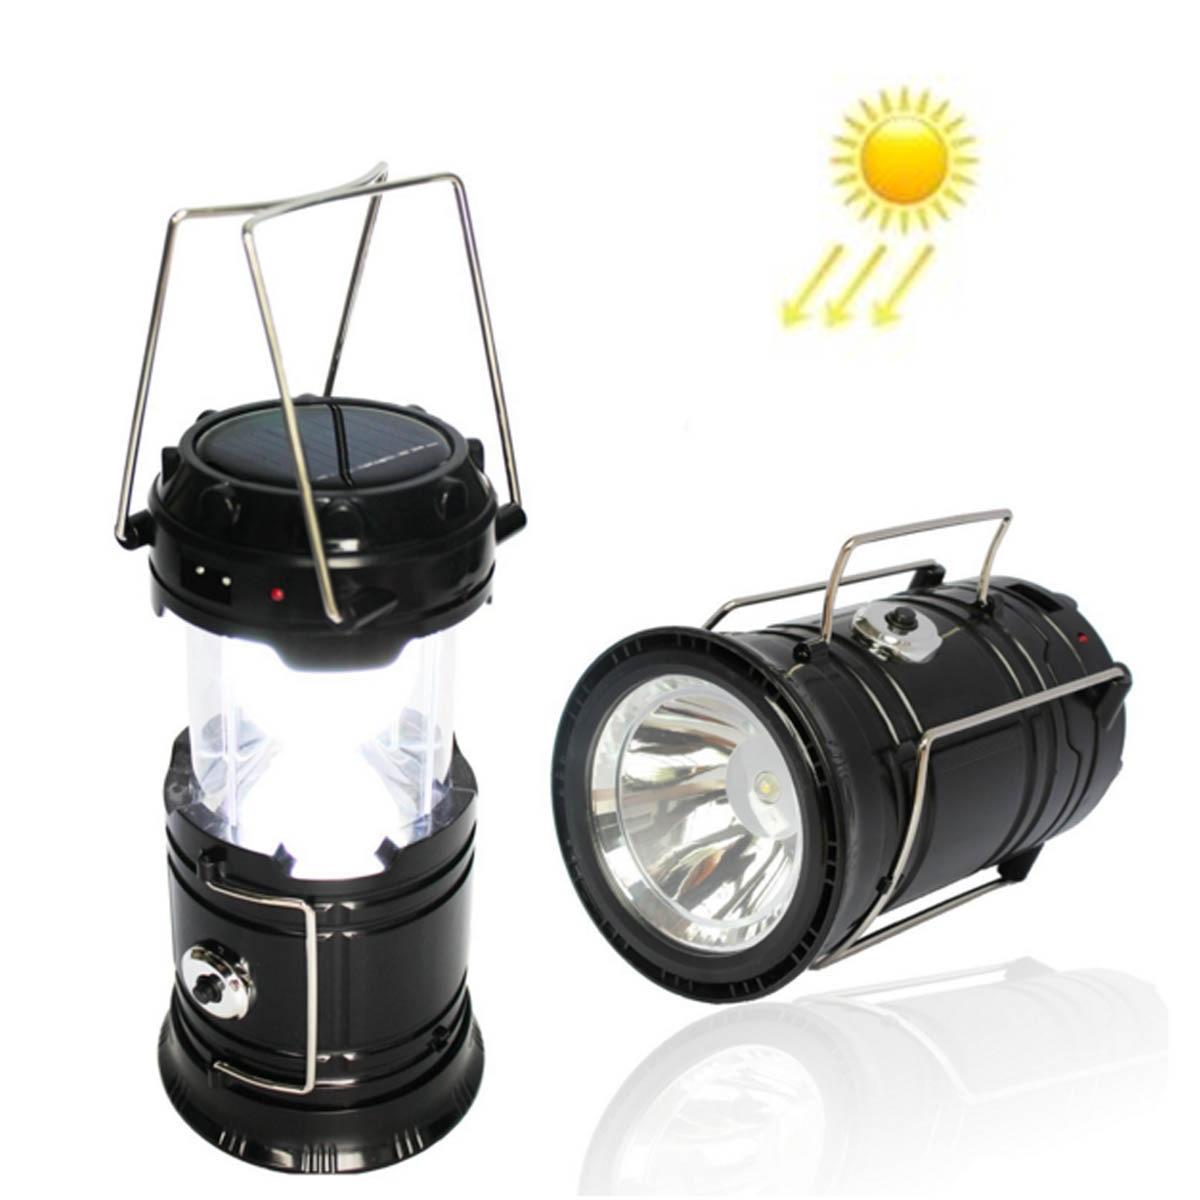 Camping Outdoor Light Lantern Retractable Folding Led Tent Flashlight Lamp UK